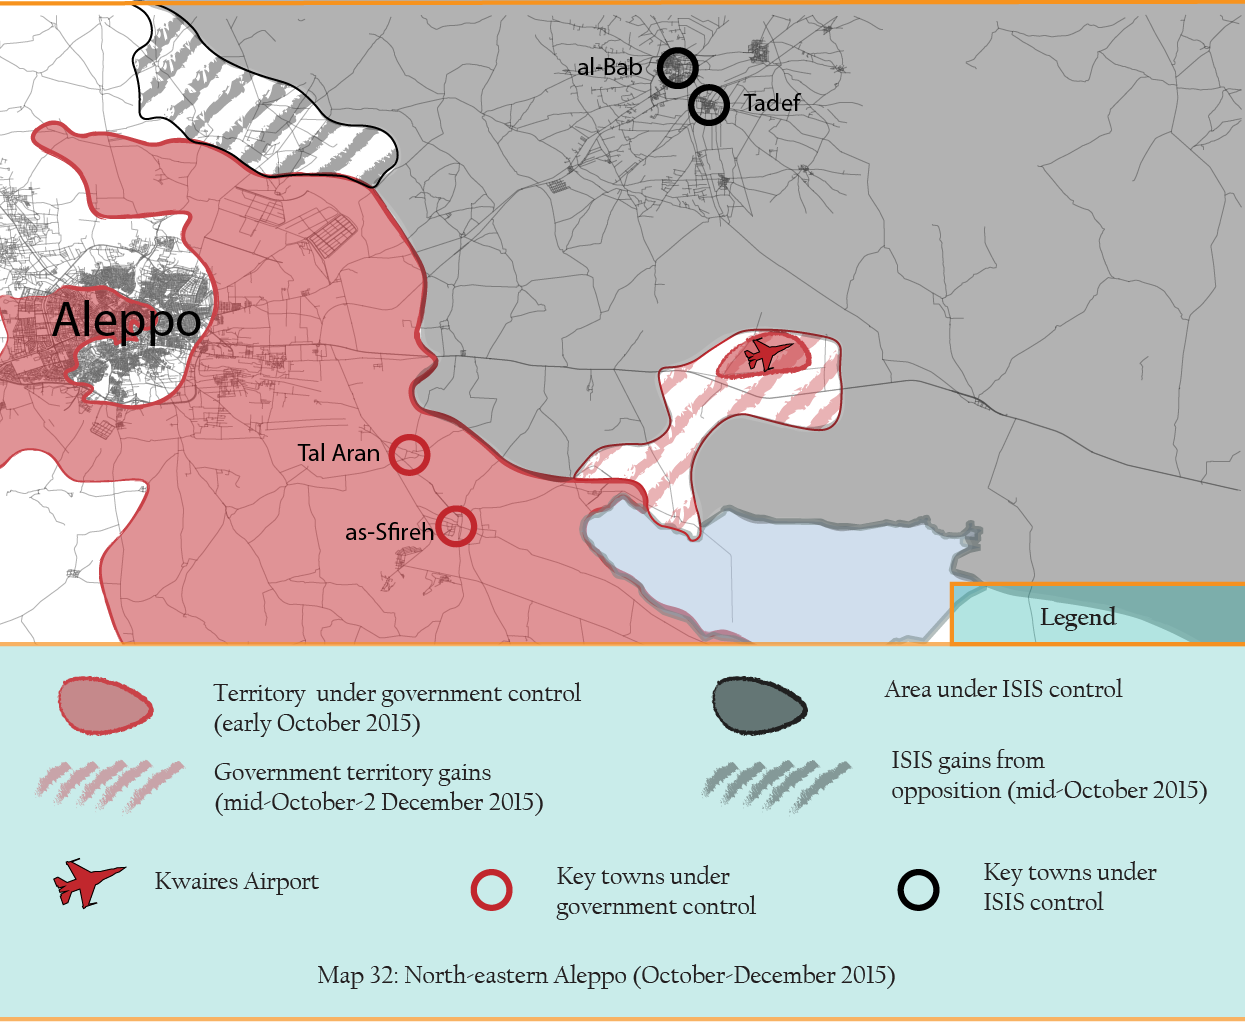 MAP 31 North-east aleppo october-november